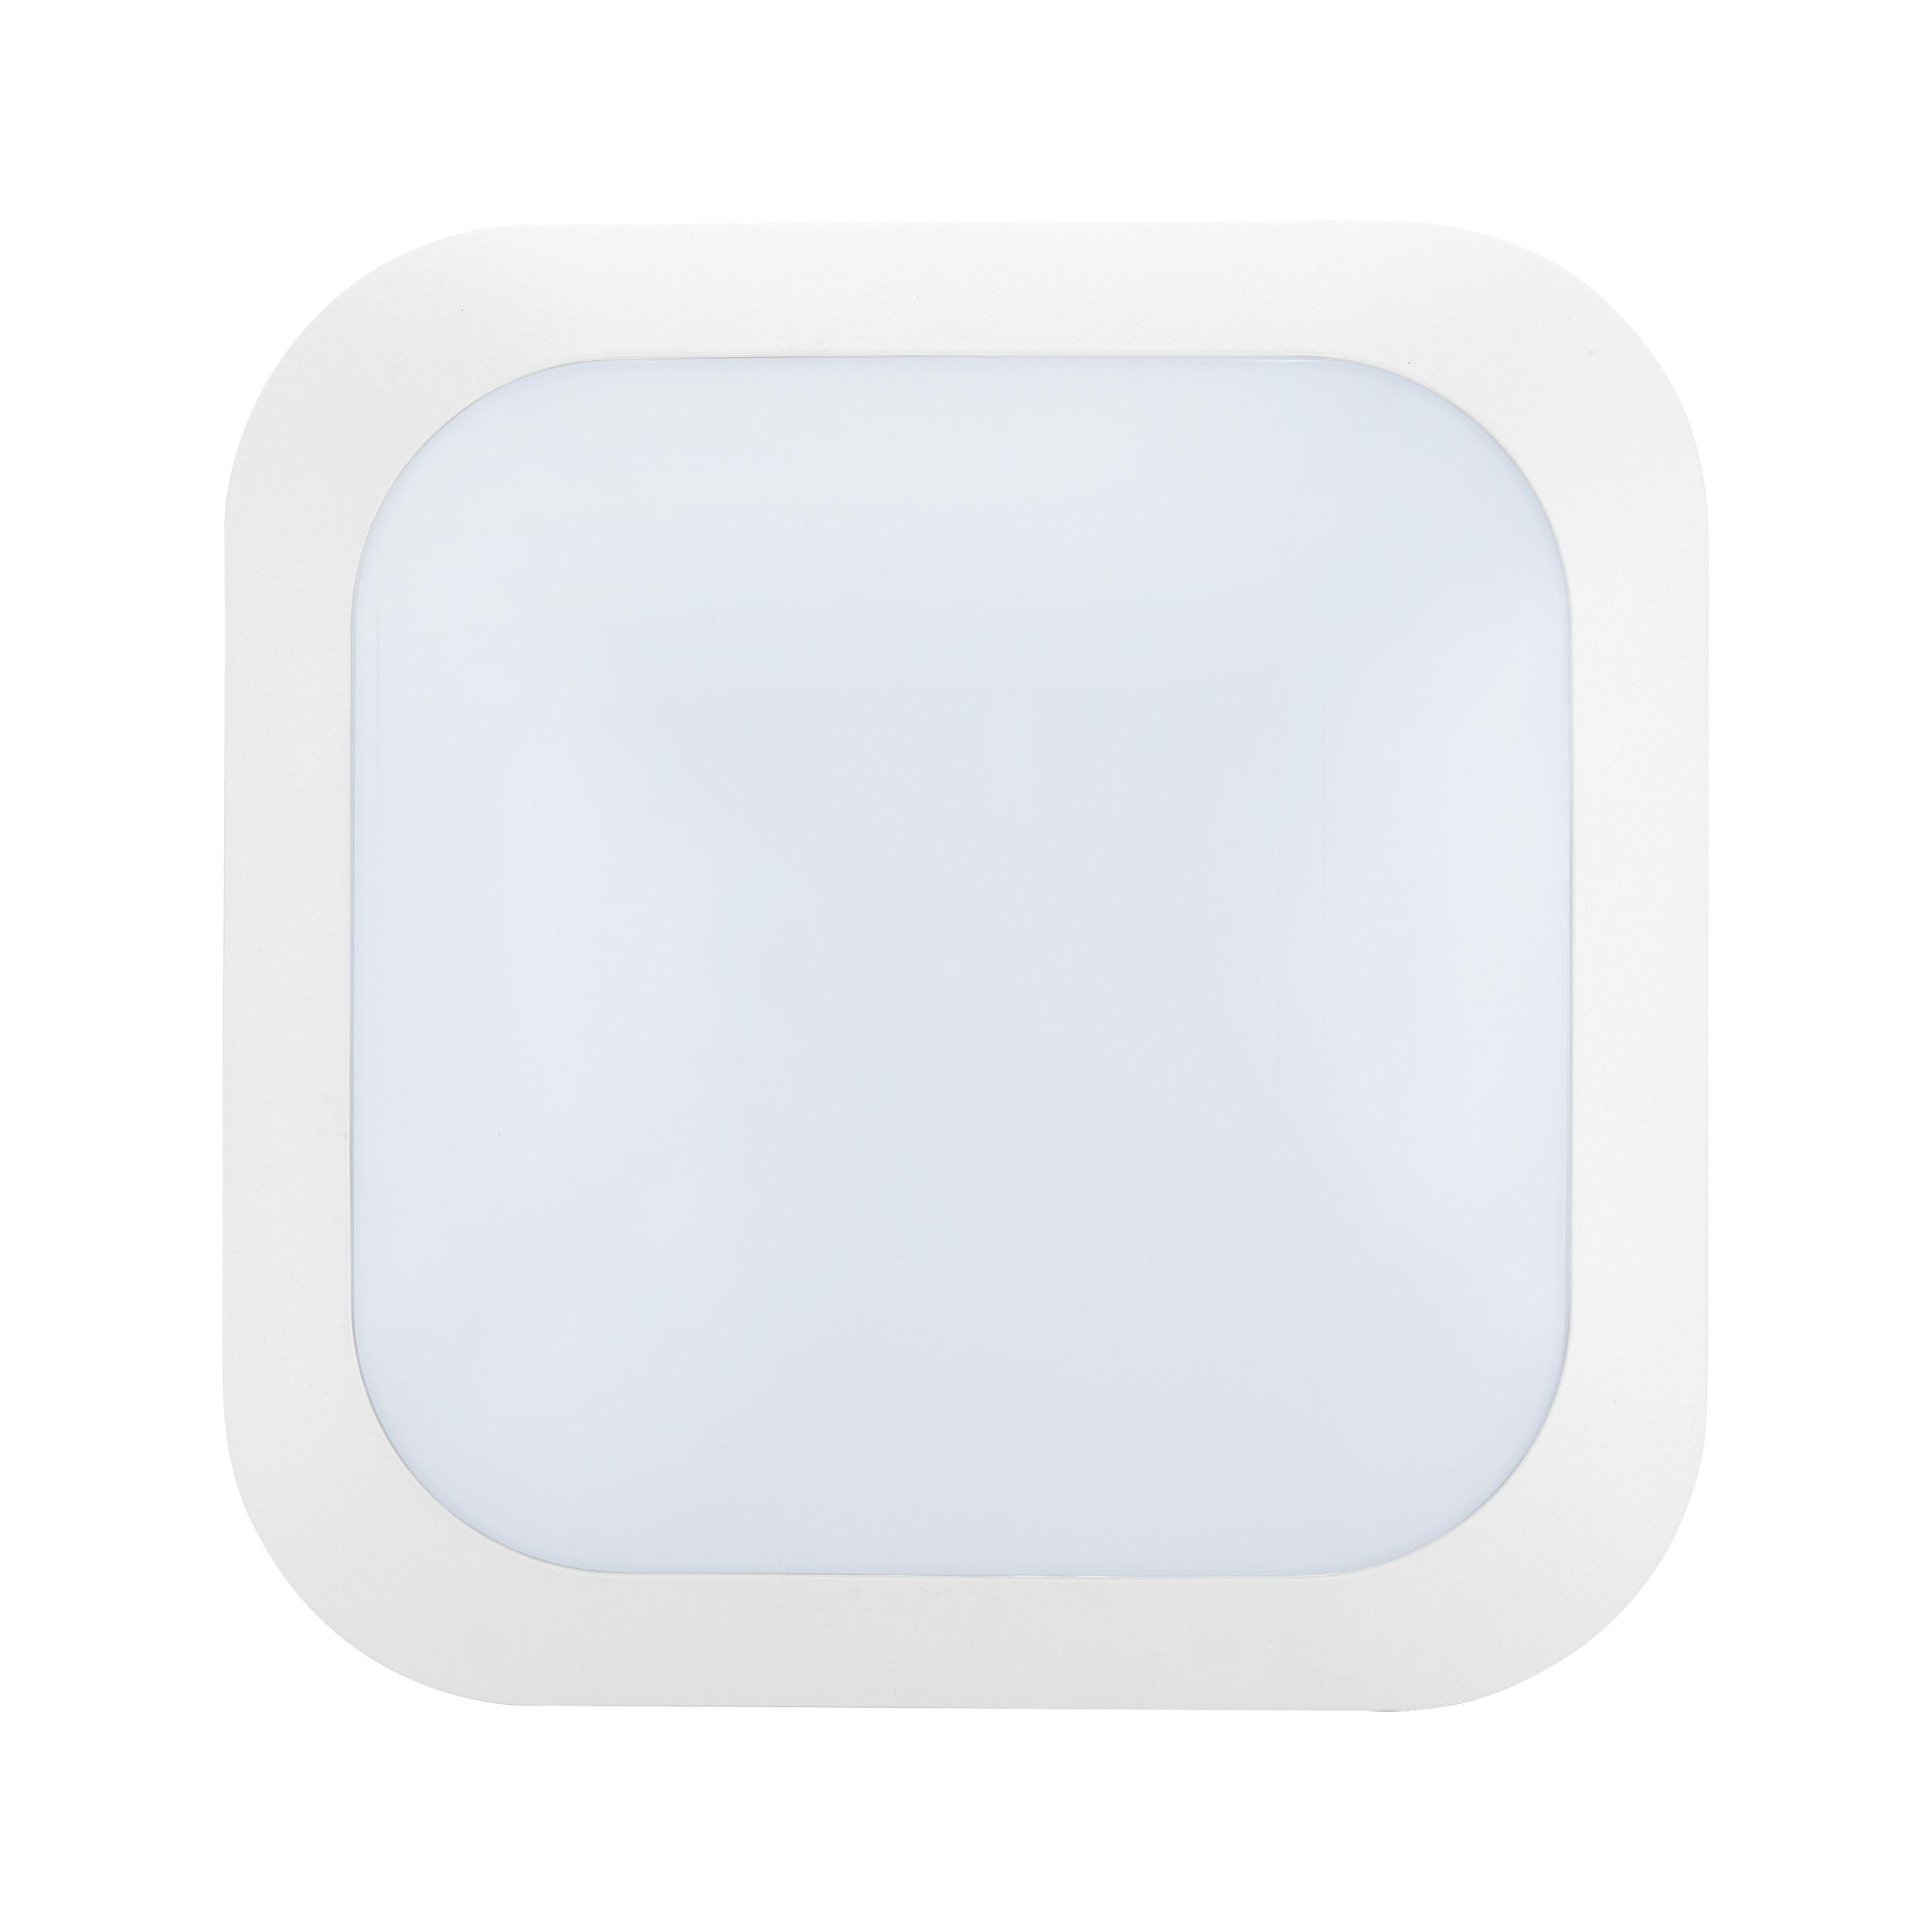 1 Stk Bellaria Wandaufbauleuchte quadratisch 12W 4000K weiß IP66 LI62226---